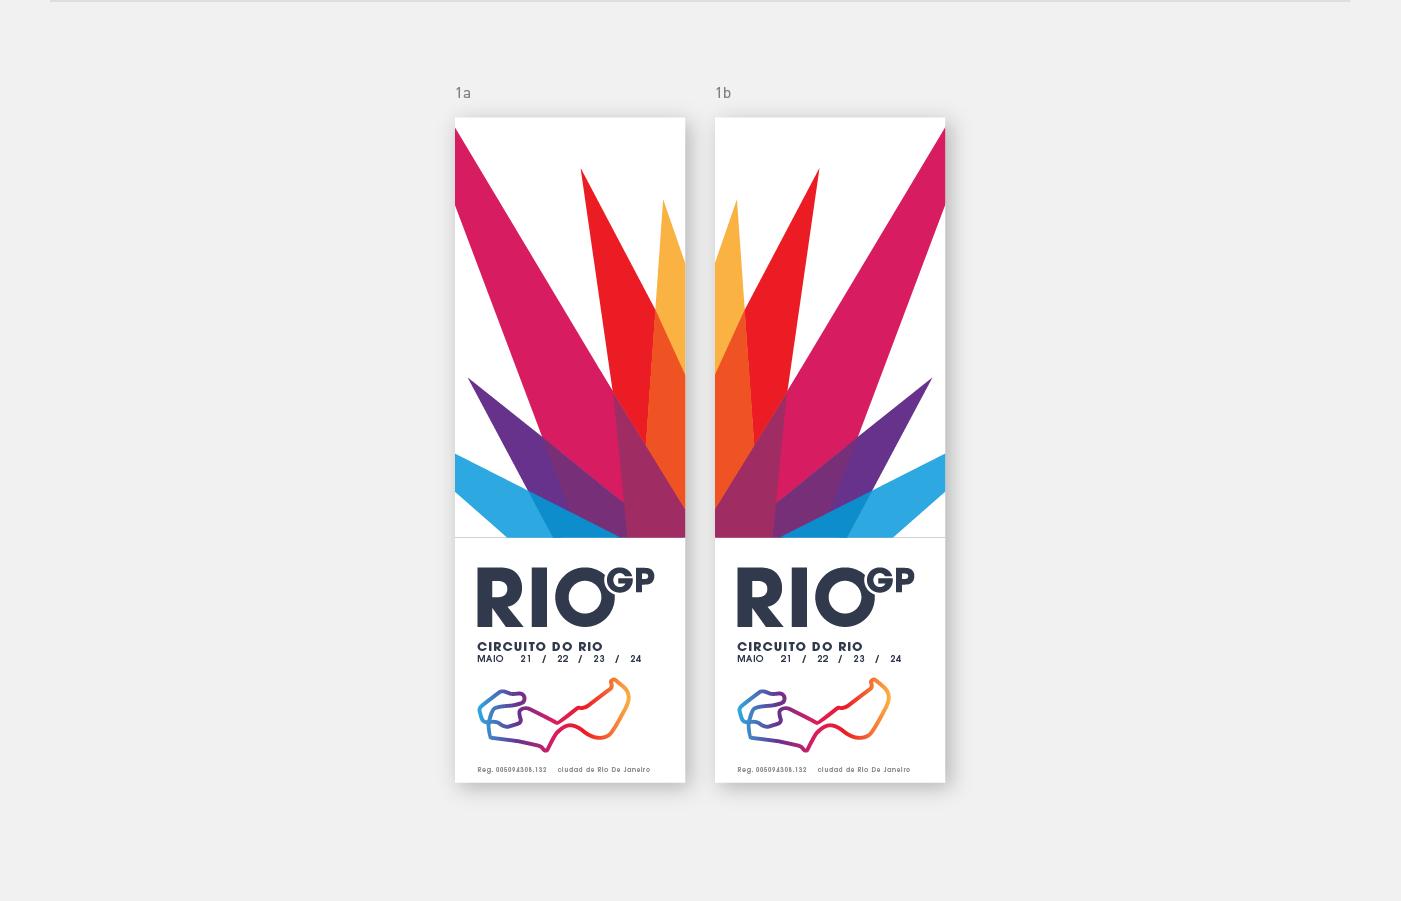 Https I Pinimg Com Originals 0d 37 6c 0d376c2a9e58c33b5189af9f774e9fb3 Png Creative Advertising Forza Rio